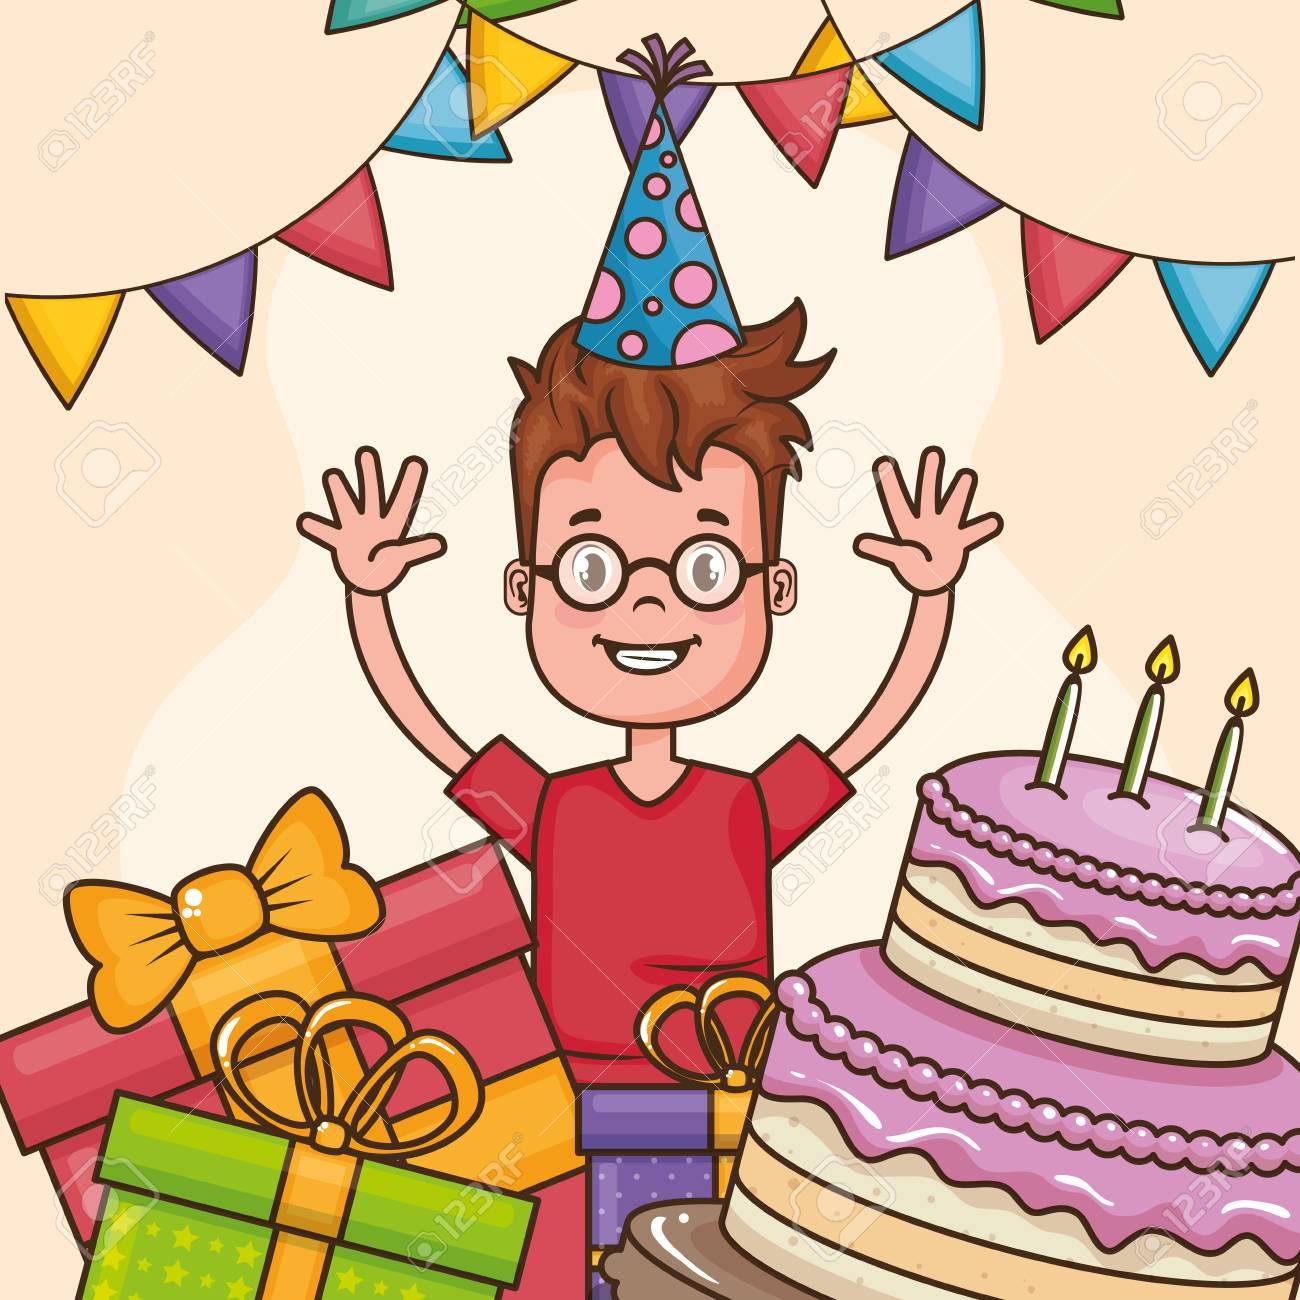 Marvelous Happy Birthday Card With Little Boy Vector Illustration Design Funny Birthday Cards Online Kookostrdamsfinfo